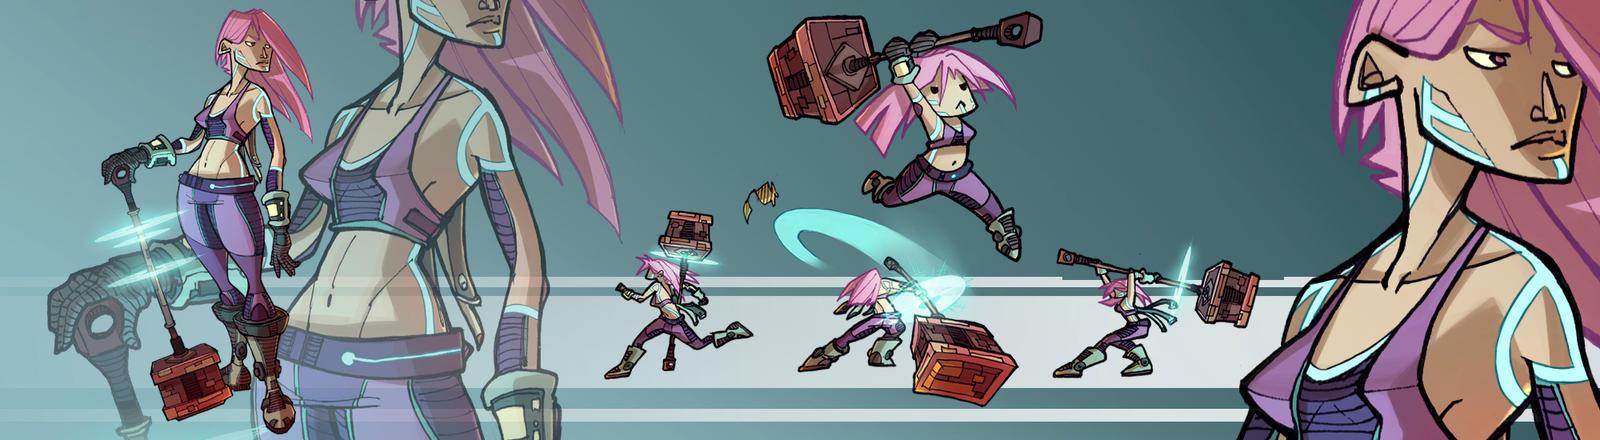 Berserk-Lightning Returns by Gyrard